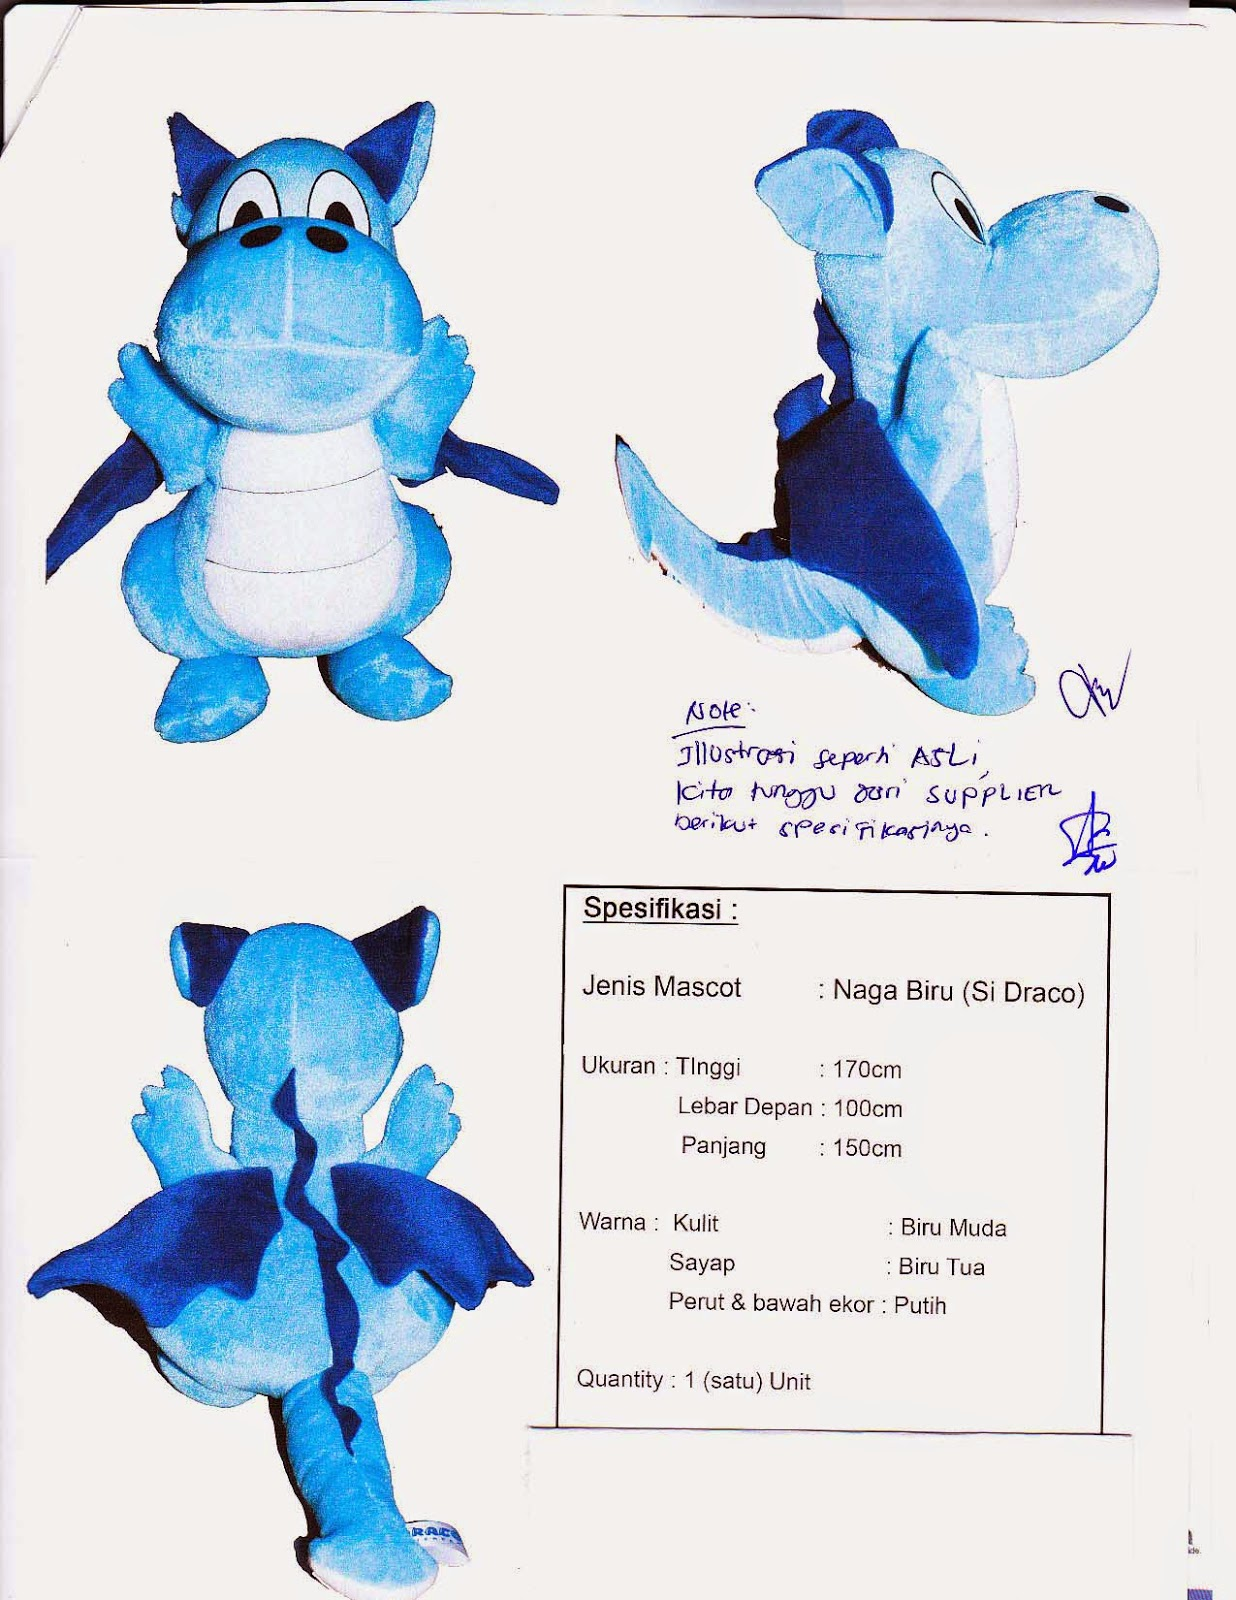 gambar desain draco naga biru badut medan